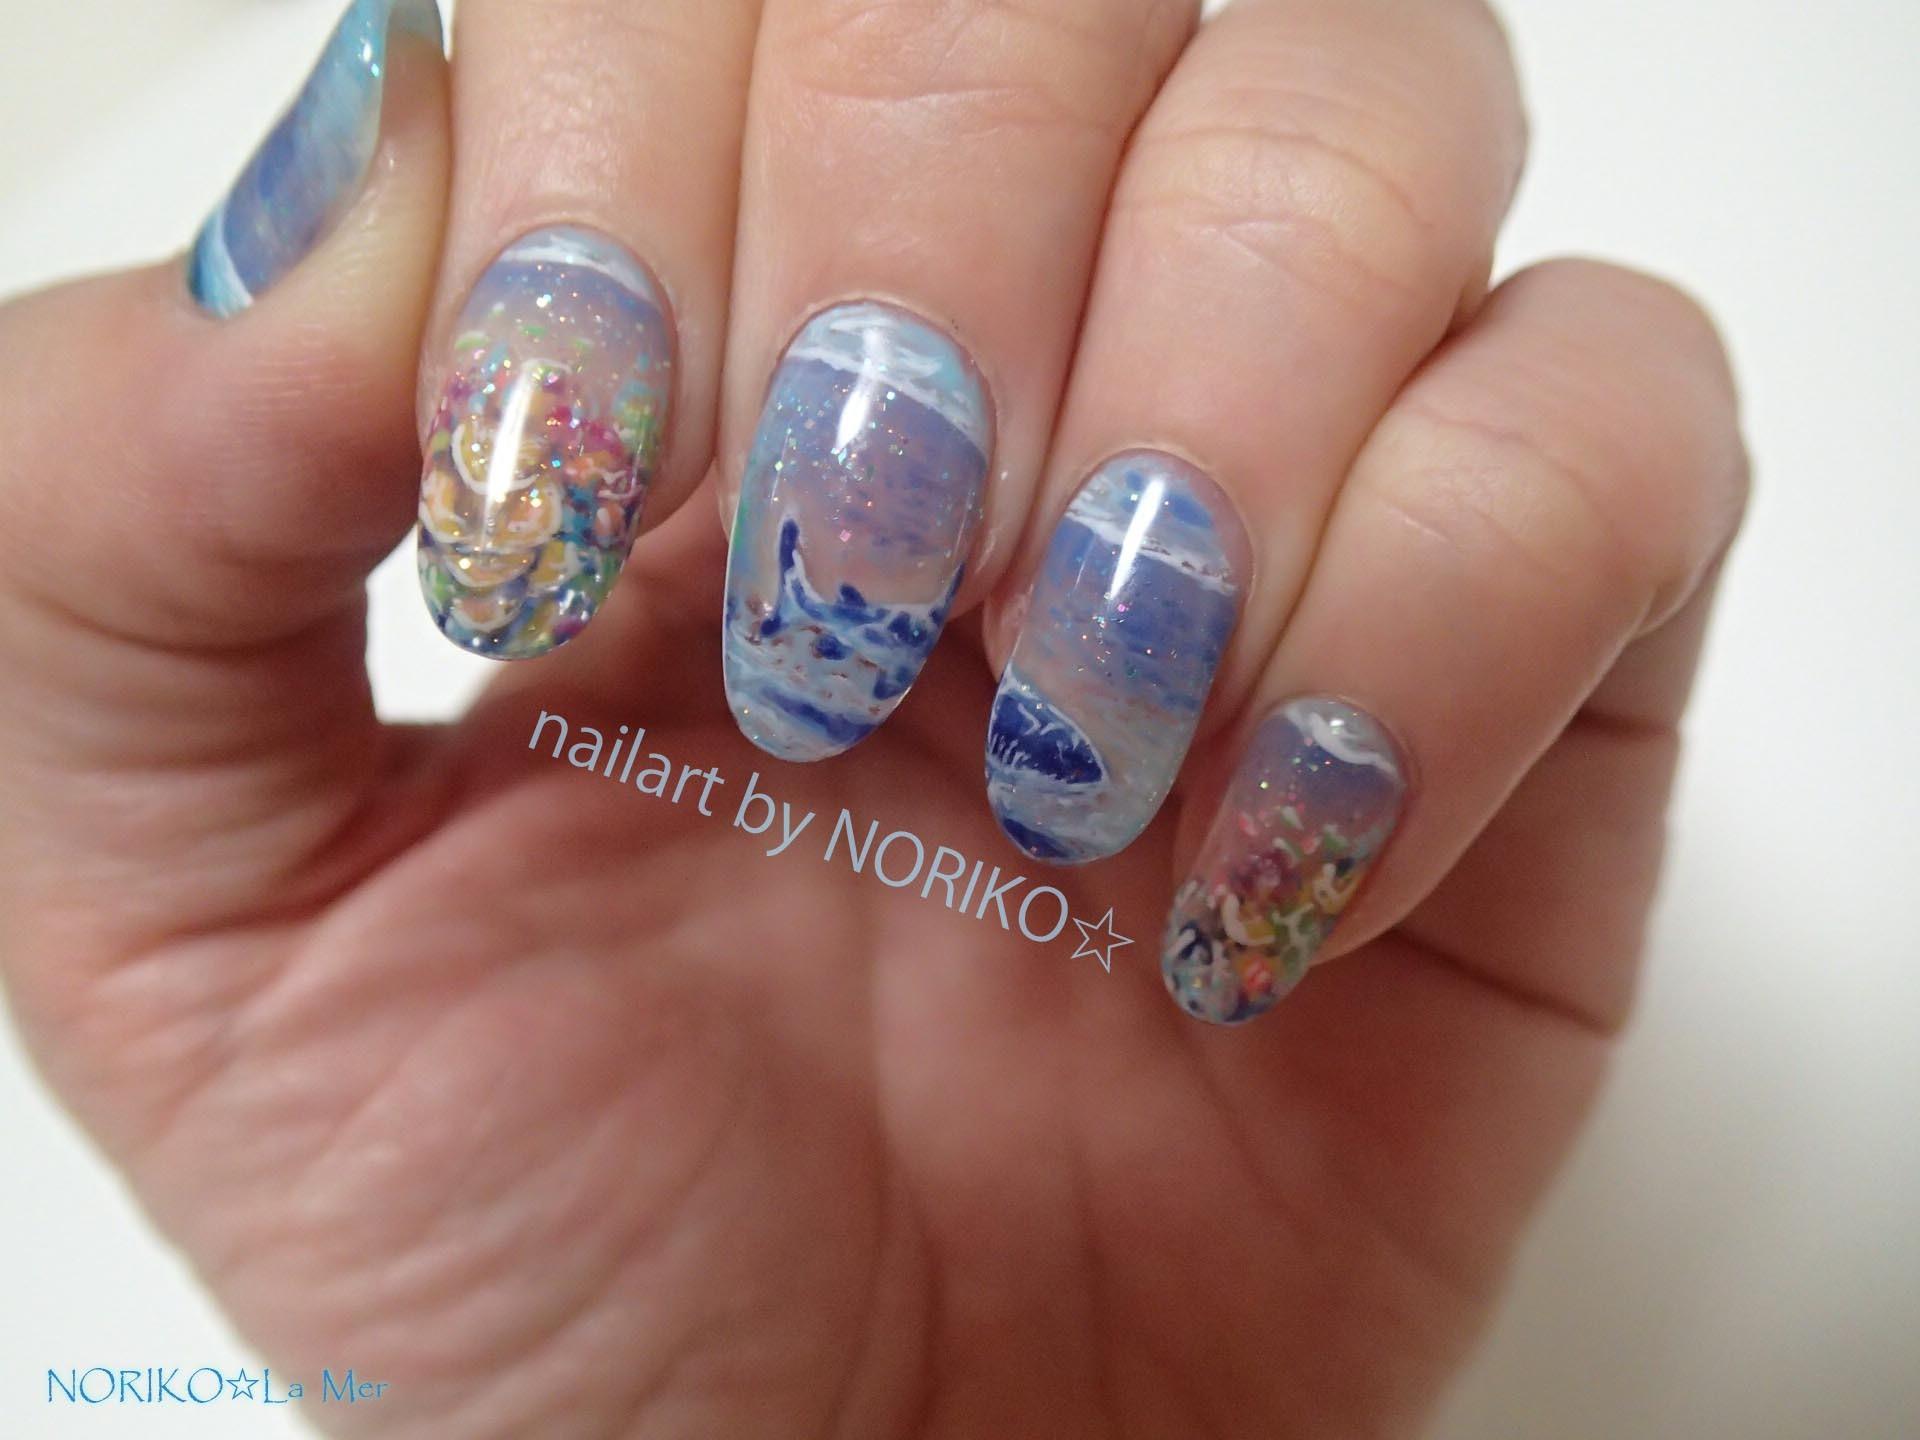 Nail Artist NORIKO palau gelpaint _1